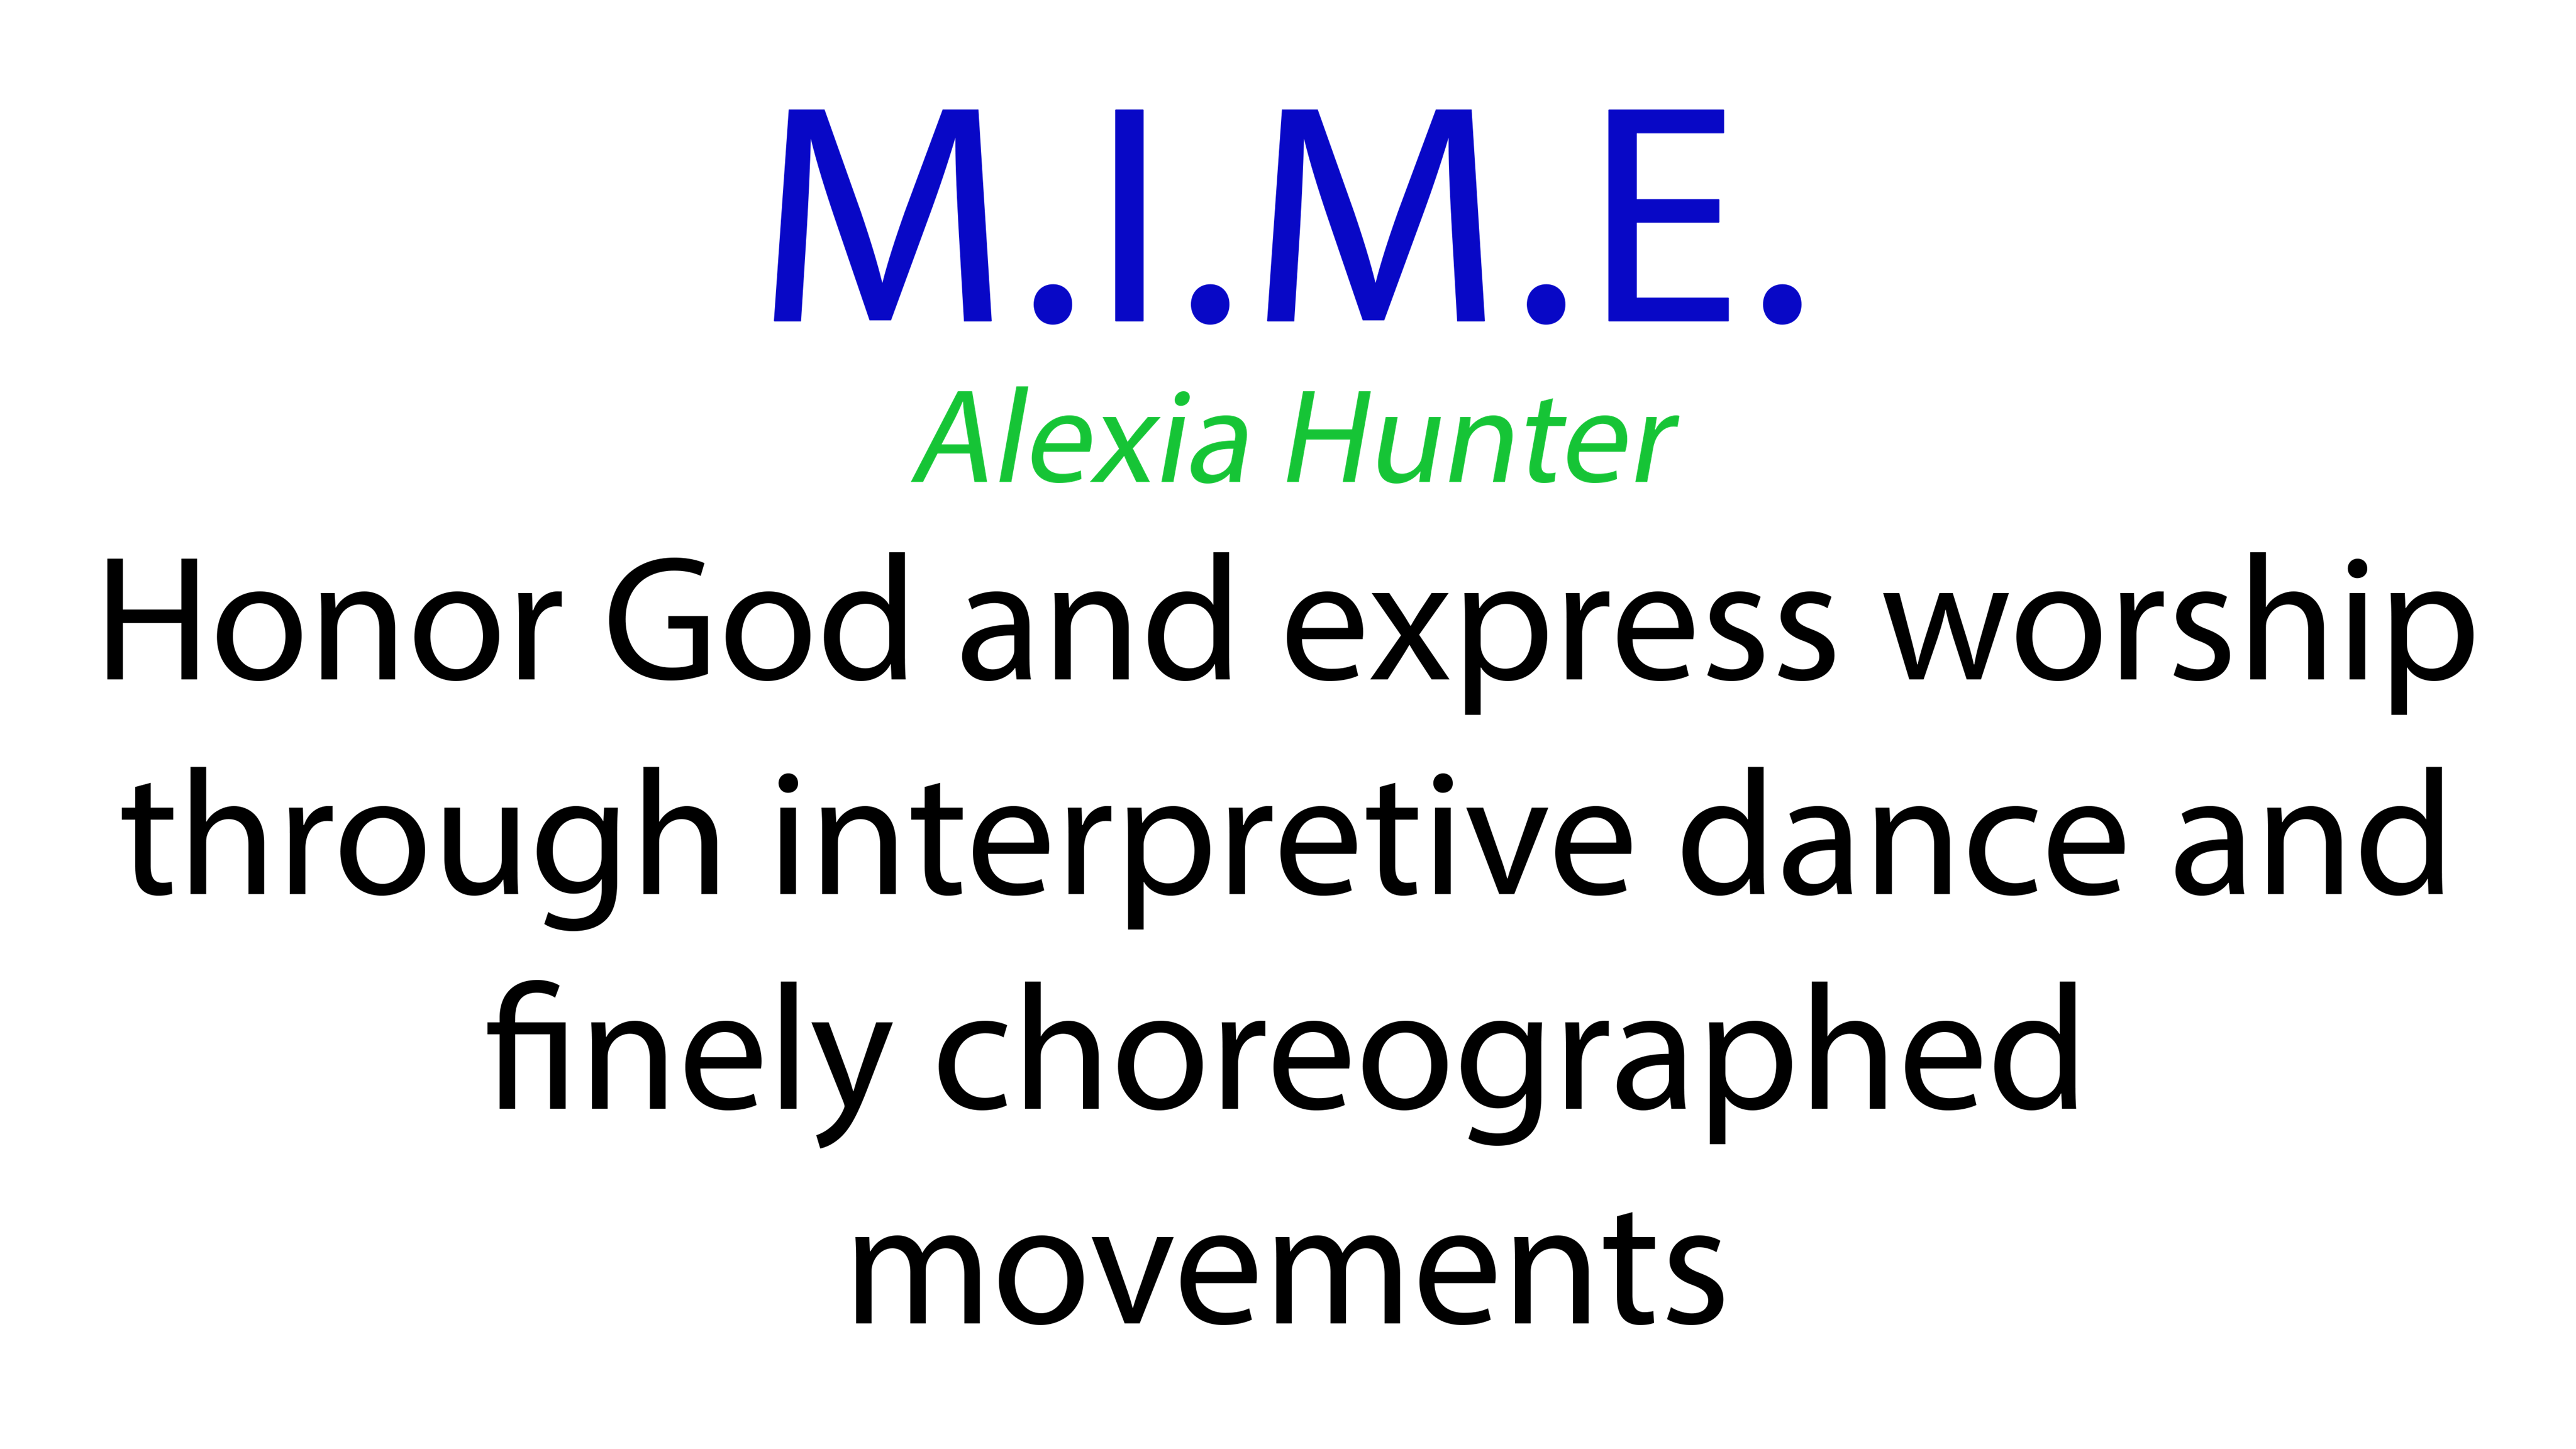 M.I.M.E.